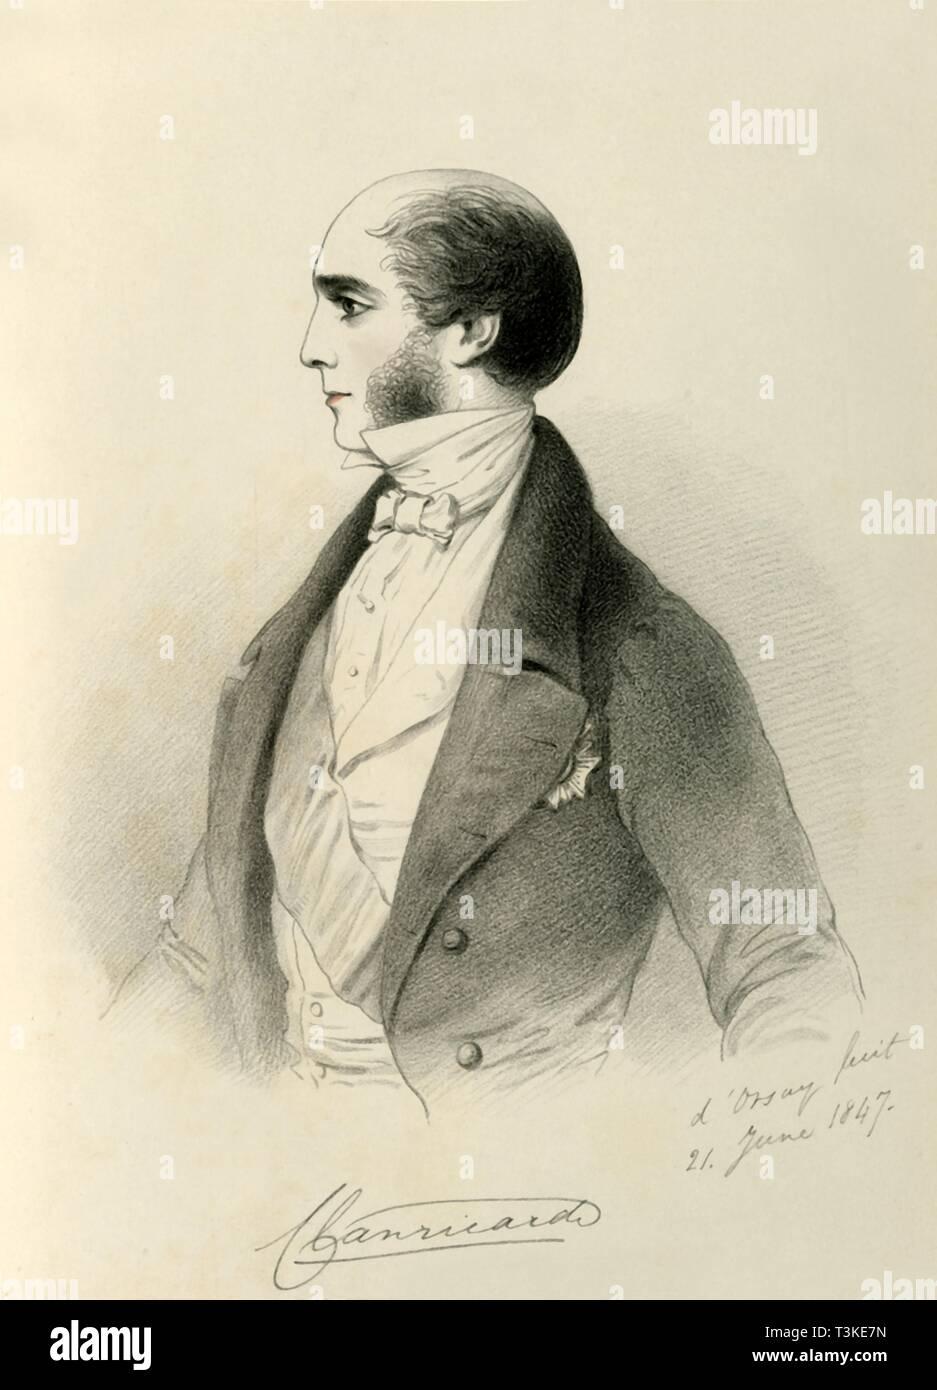 'The Marquis of Clanricarde', 1847. Creator: Richard James Lane. - Stock Image